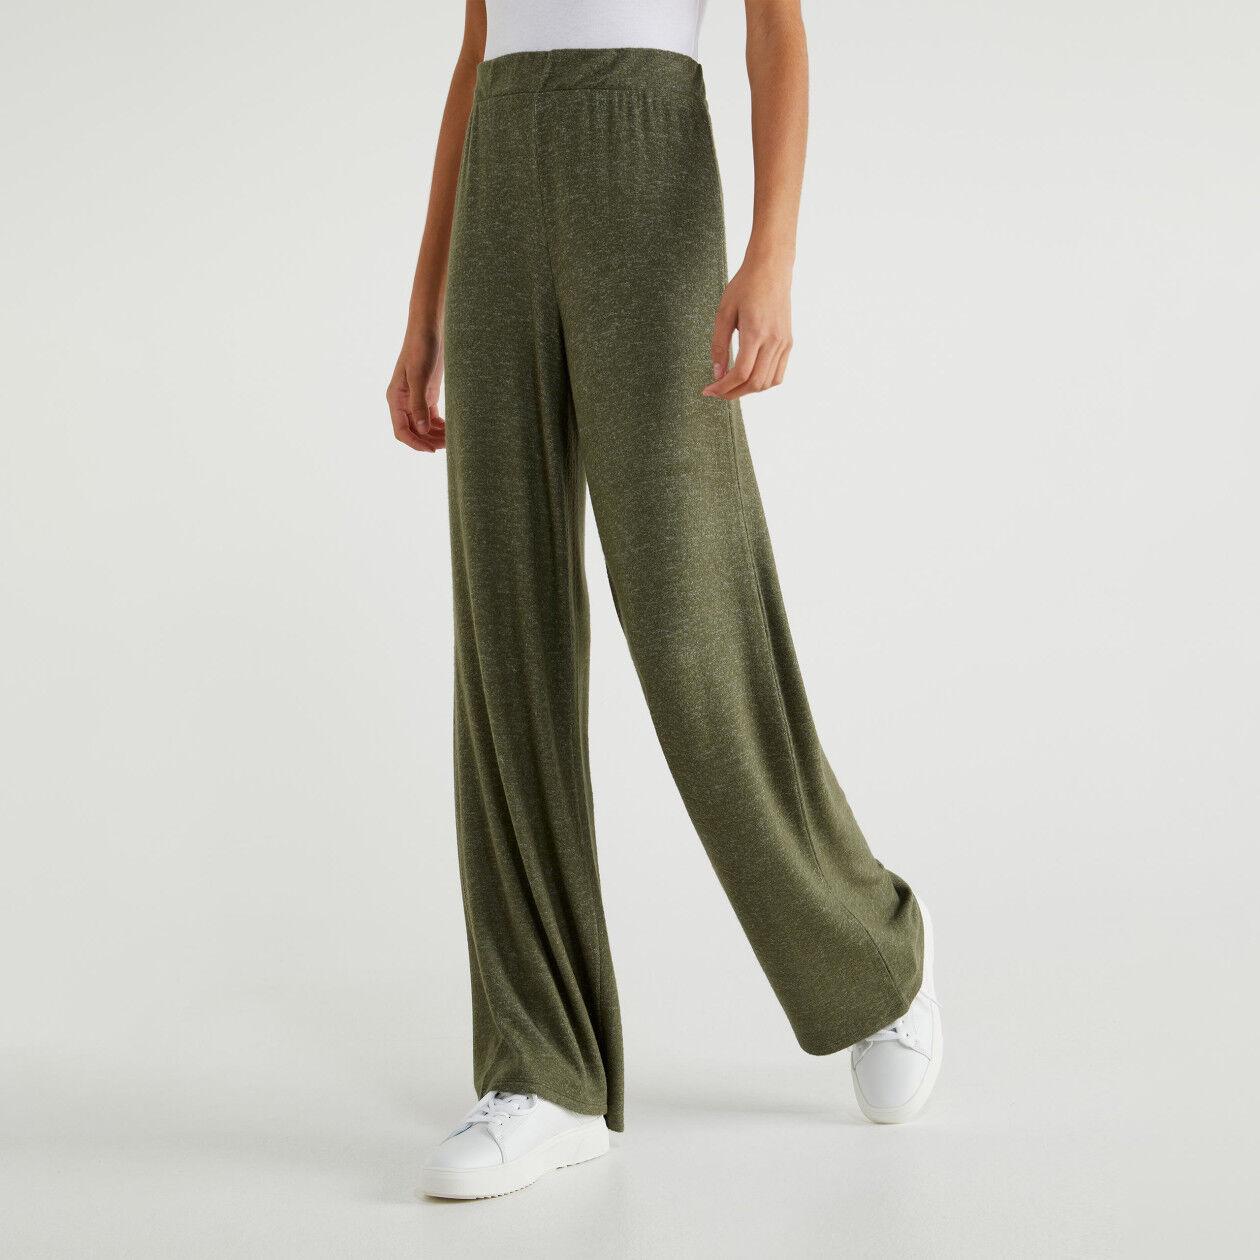 Pantalón en tejido de punto